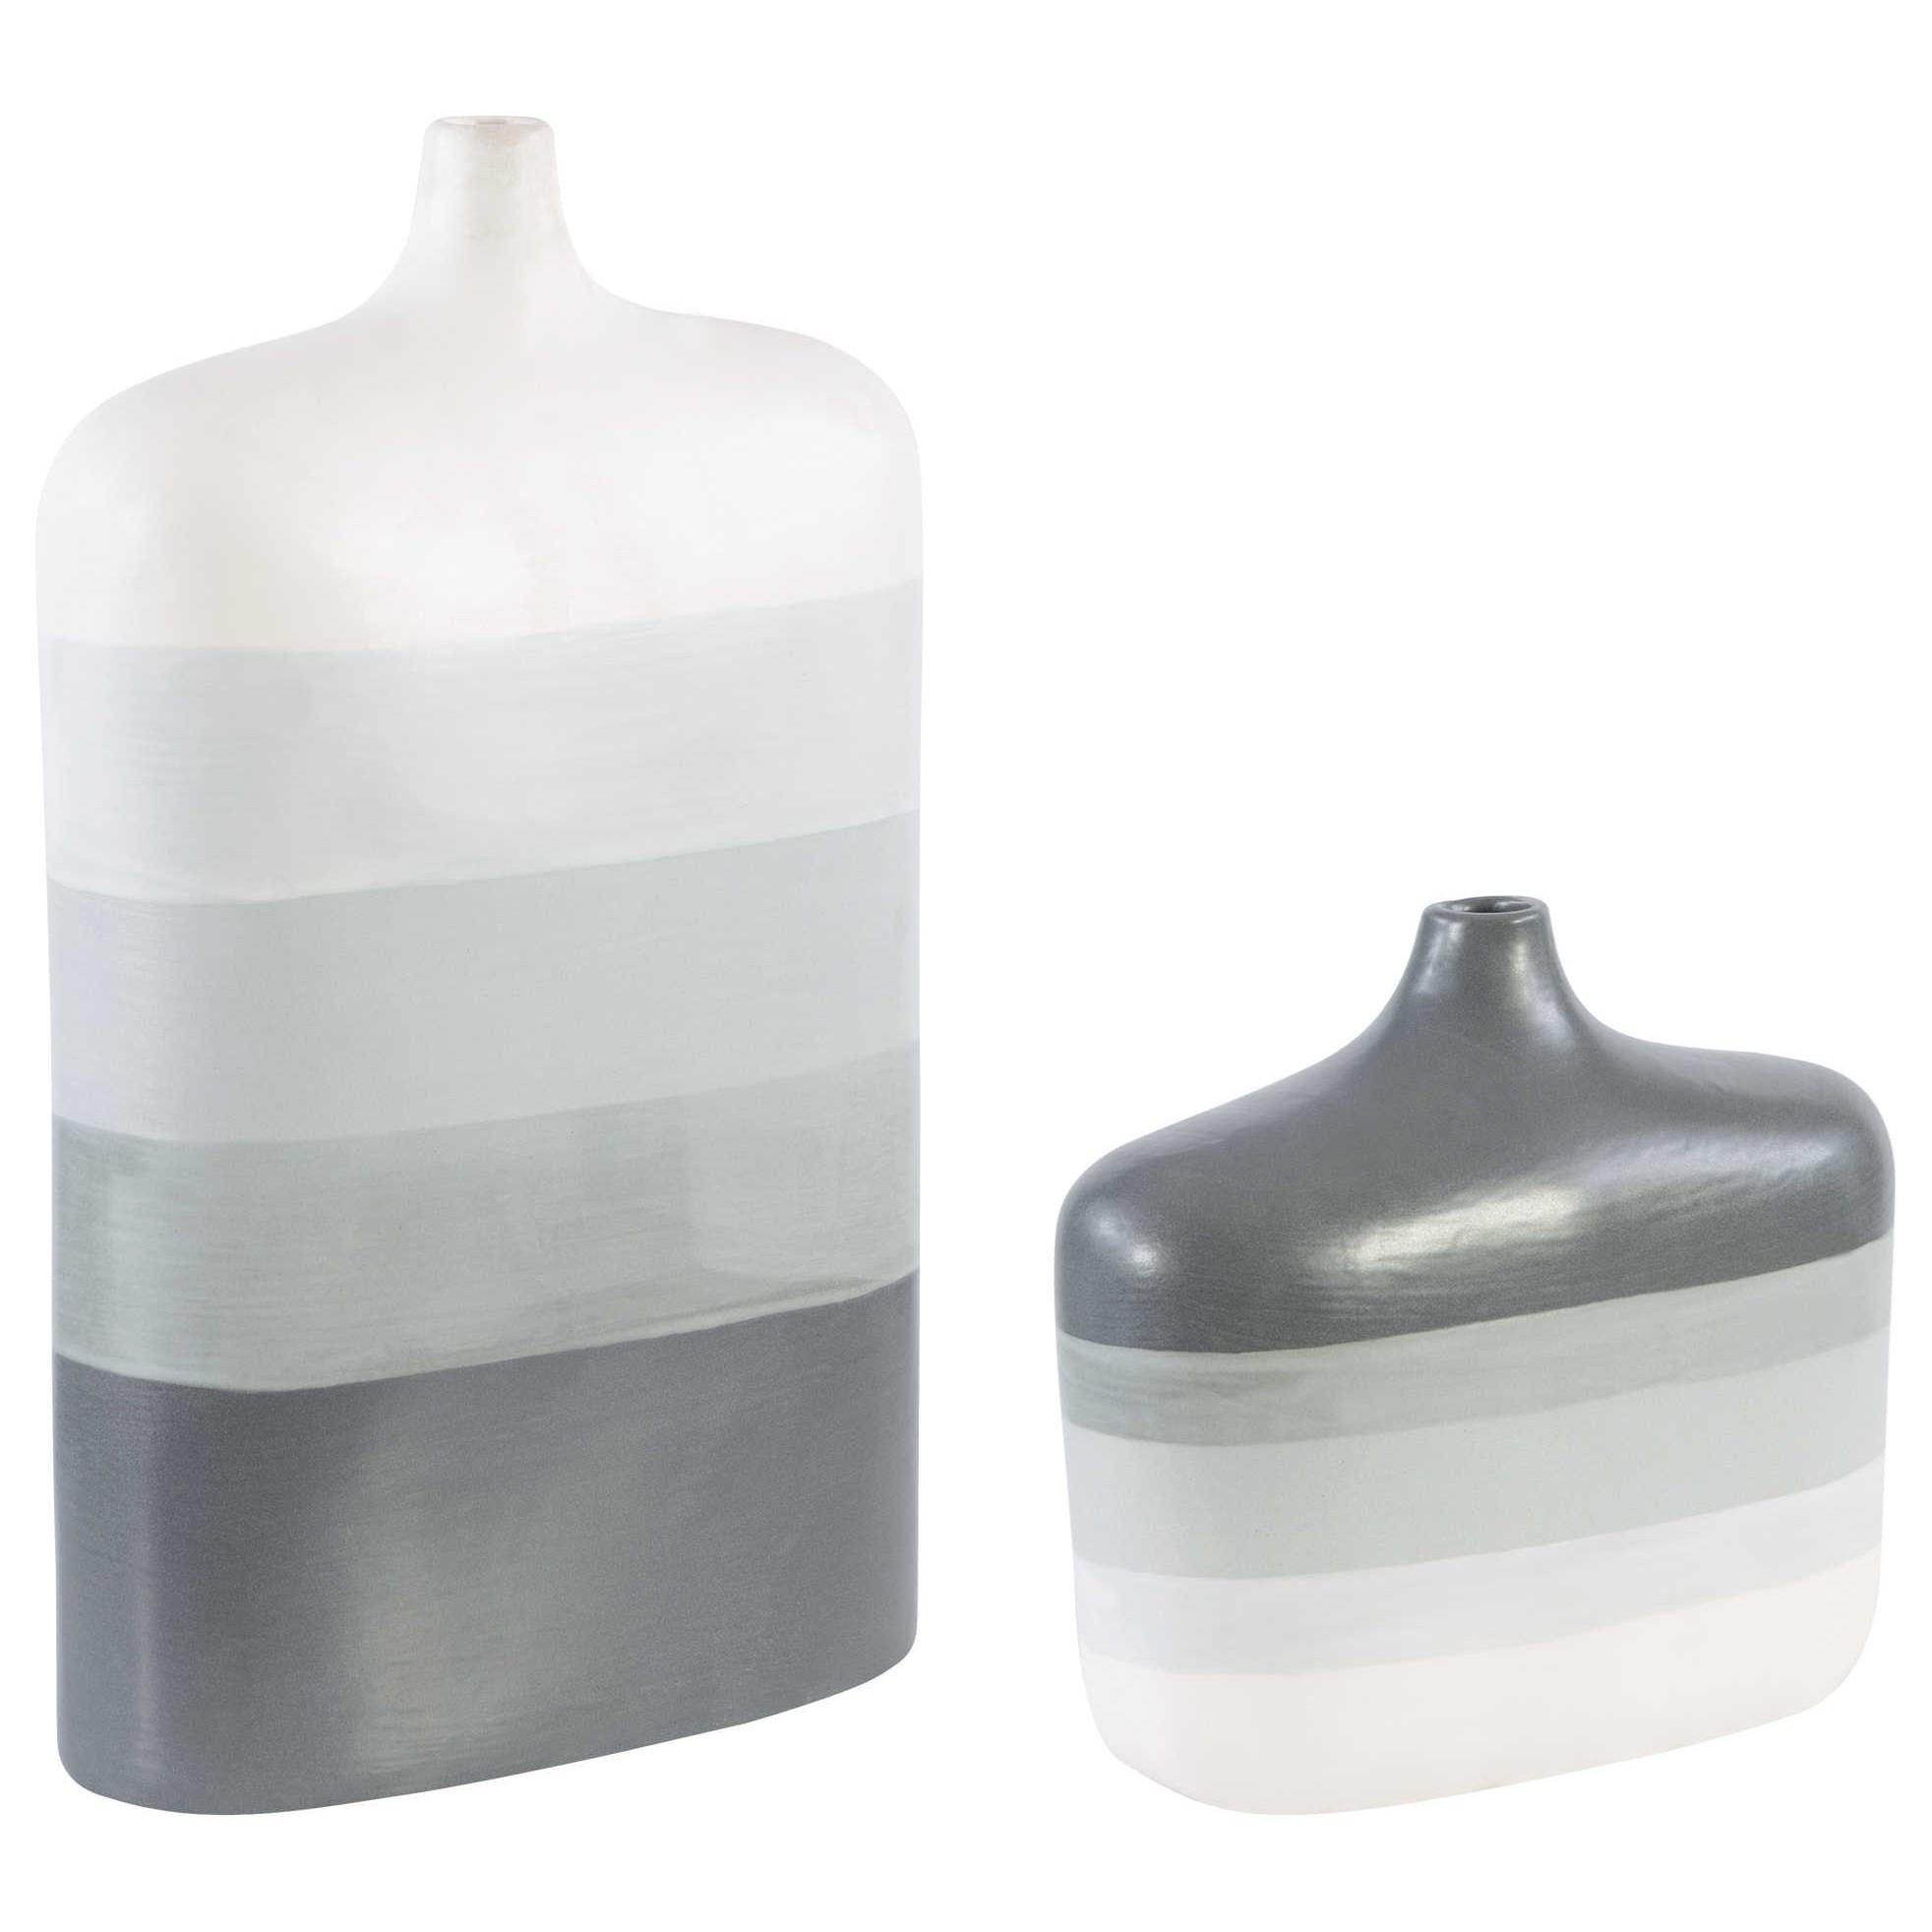 Guevara Striped Gray Vases, Set of 2